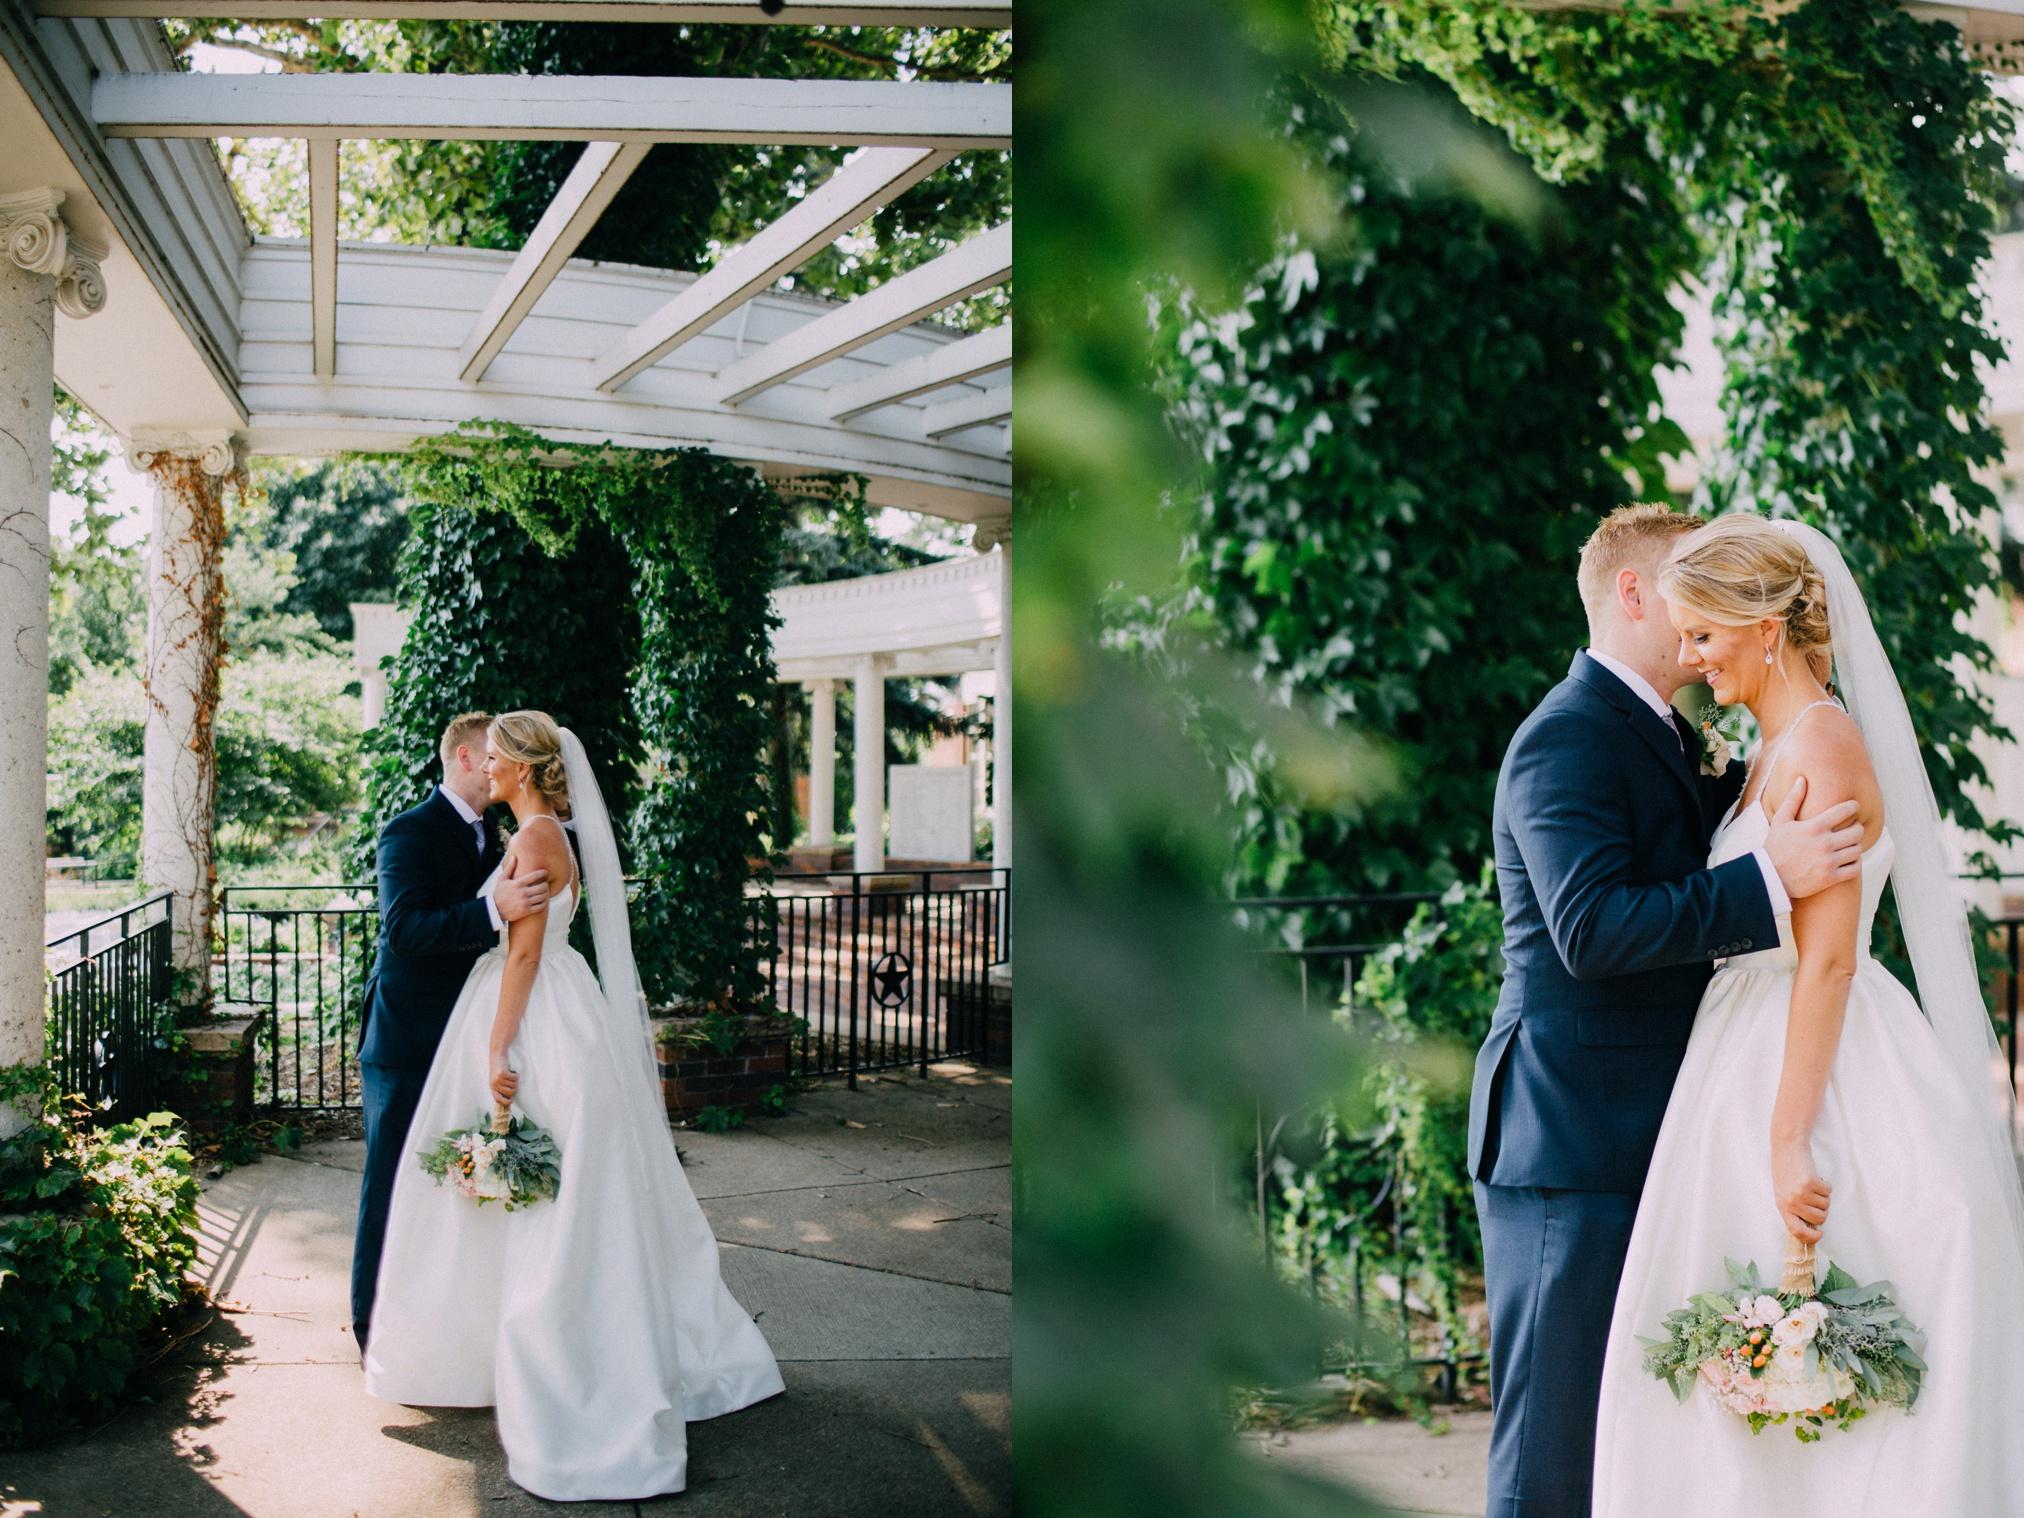 brenna+michael_wedding-265.jpg